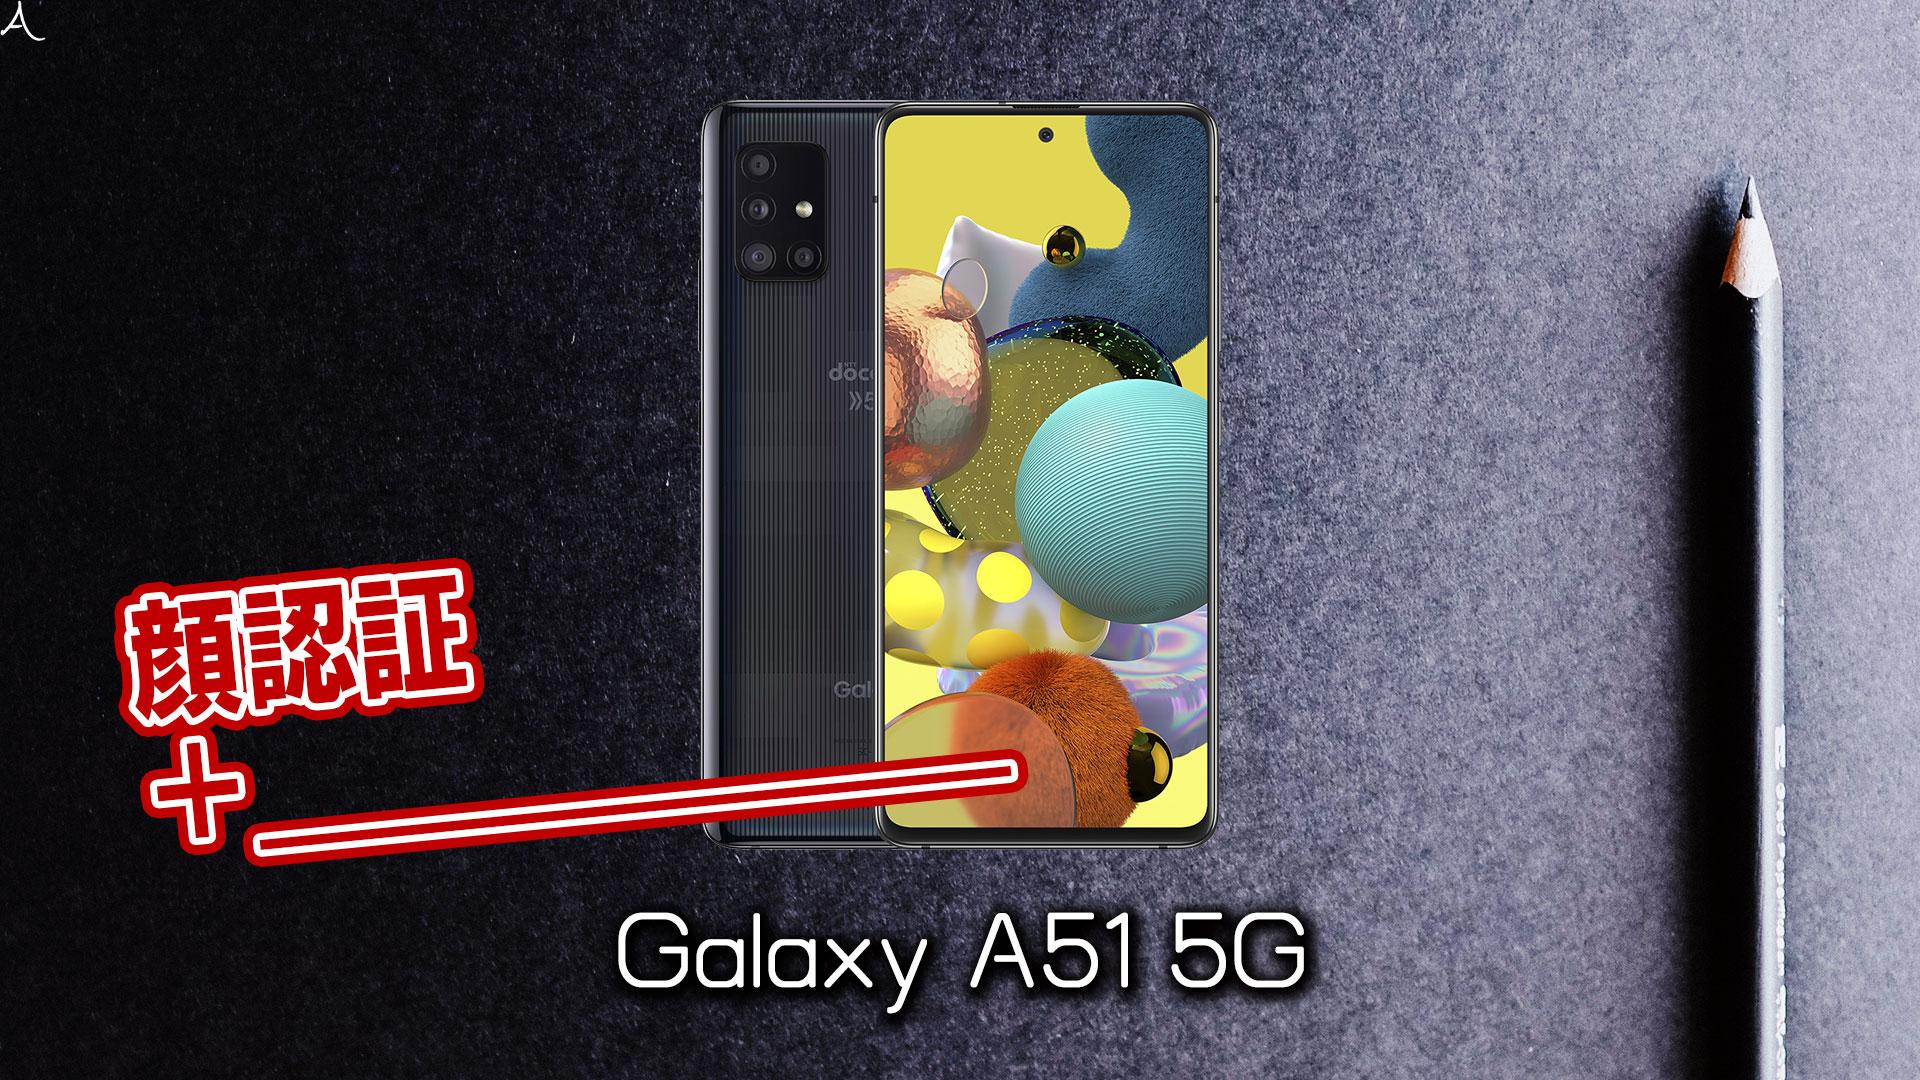 「Galaxy A51 5G」で使える2つの生体認証機能とその特徴を解説:虹彩認証はある?